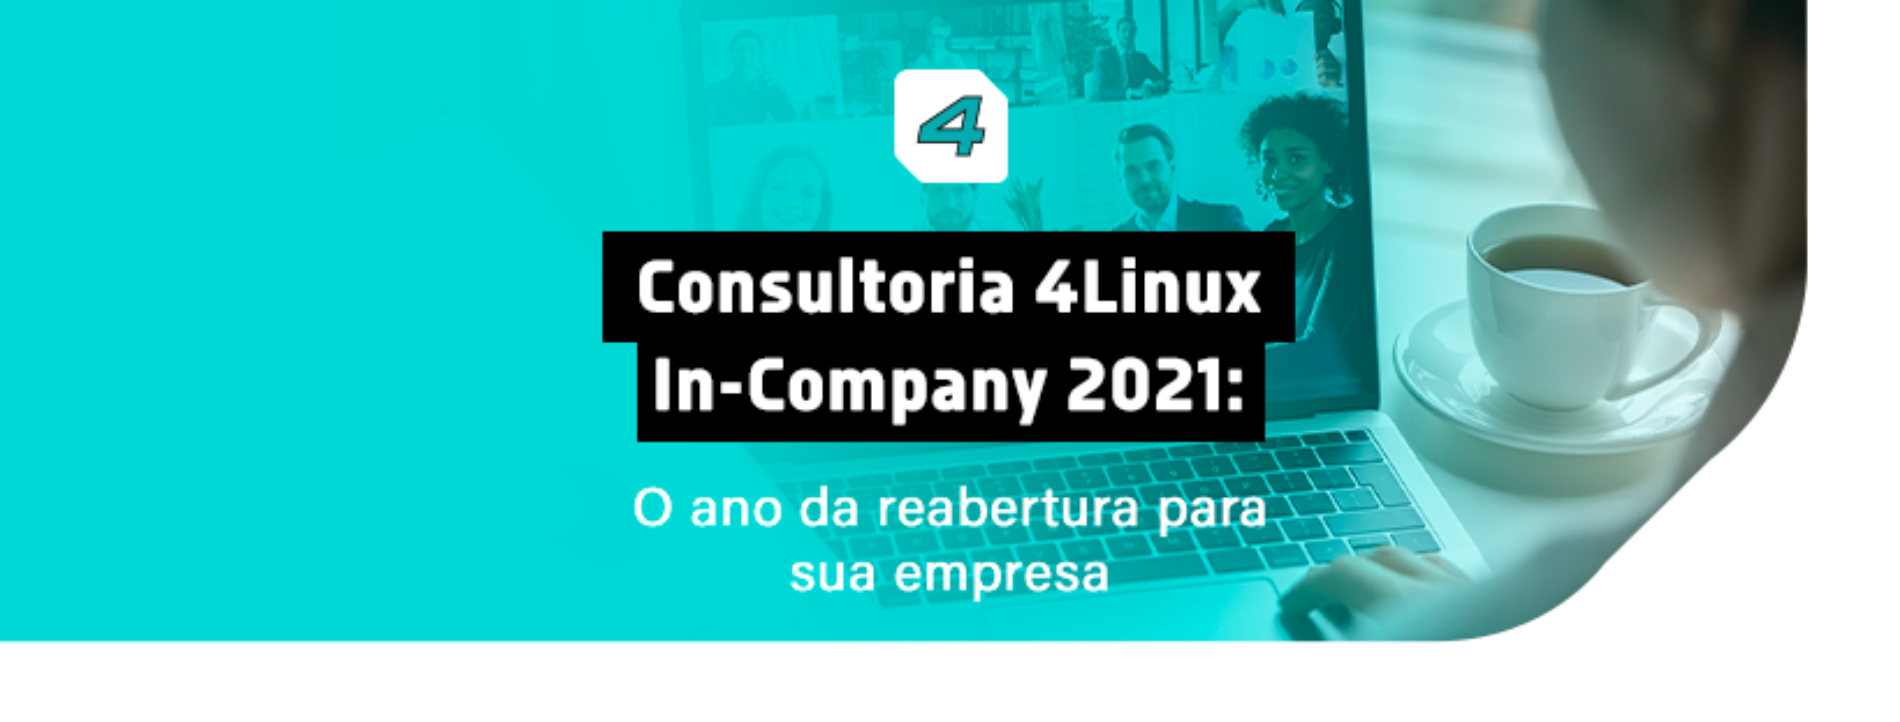 Consultoria 4Linux In-Company 2021: O Ano da Reabertura para sua Empresa